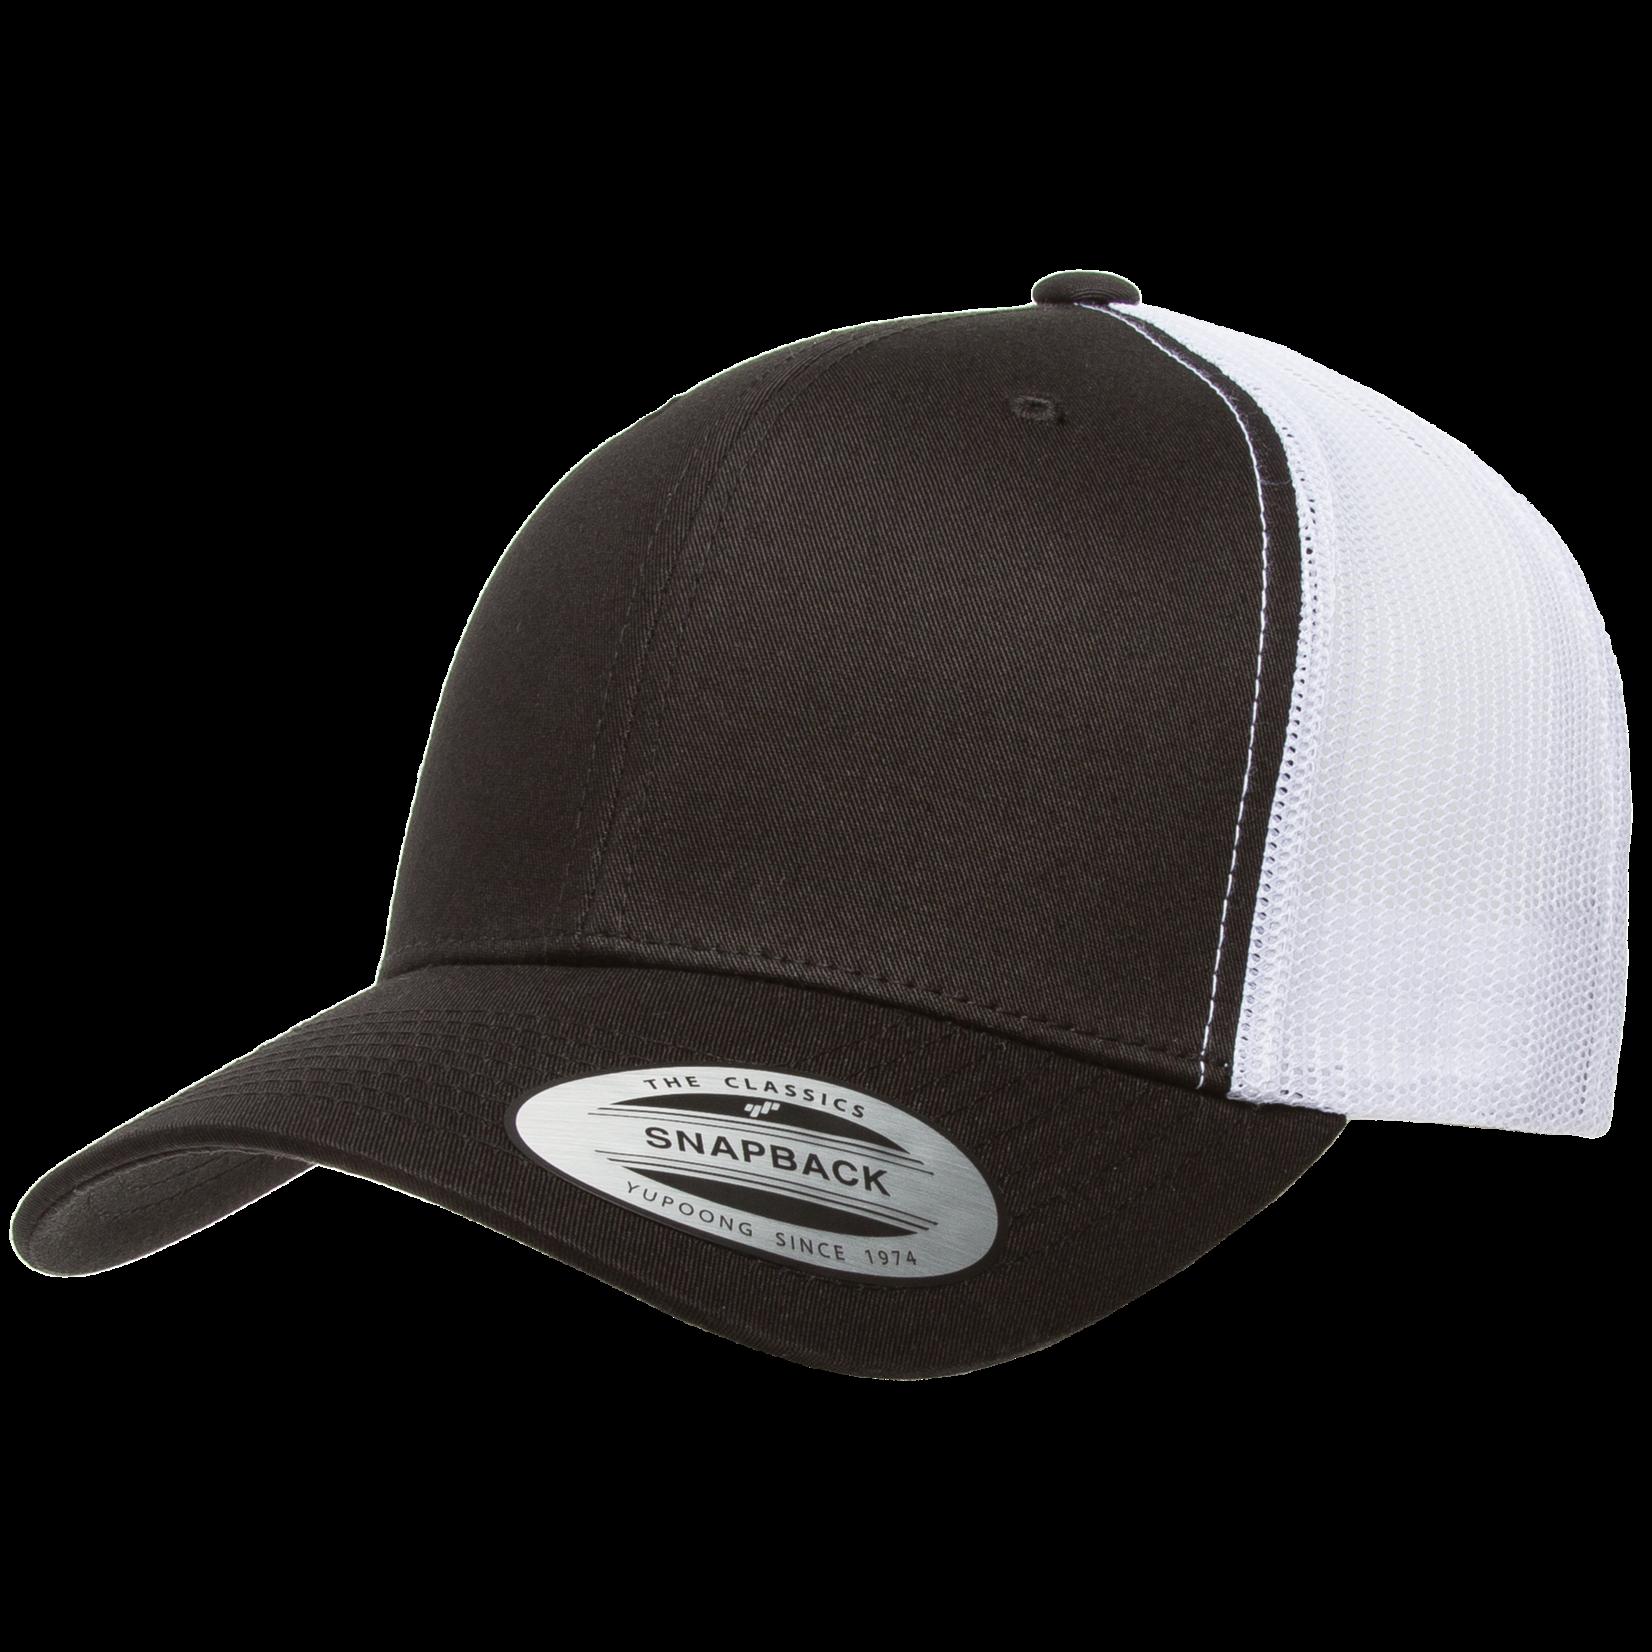 Flexfit Flexfit 6606T 2-Tone Snapback Trucker Hat - Black/White